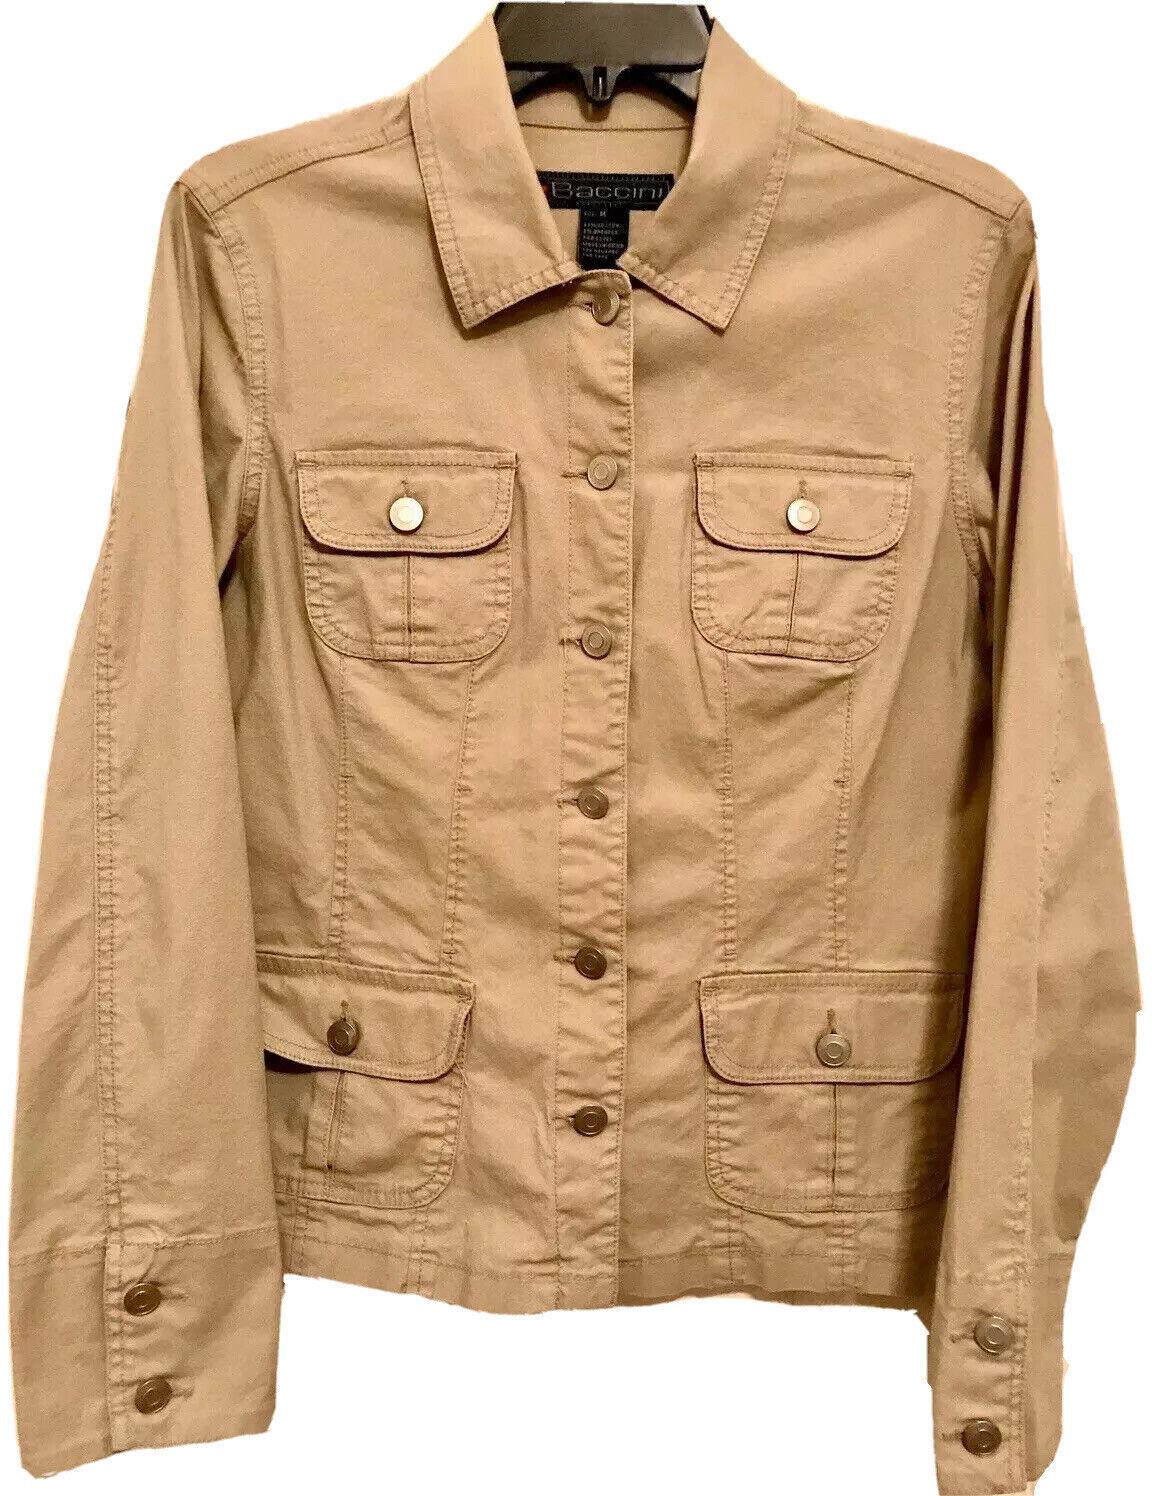 Baccini Women's Safari Utility Cargo Pocket Khaki Cotton Twill Jacket Medium